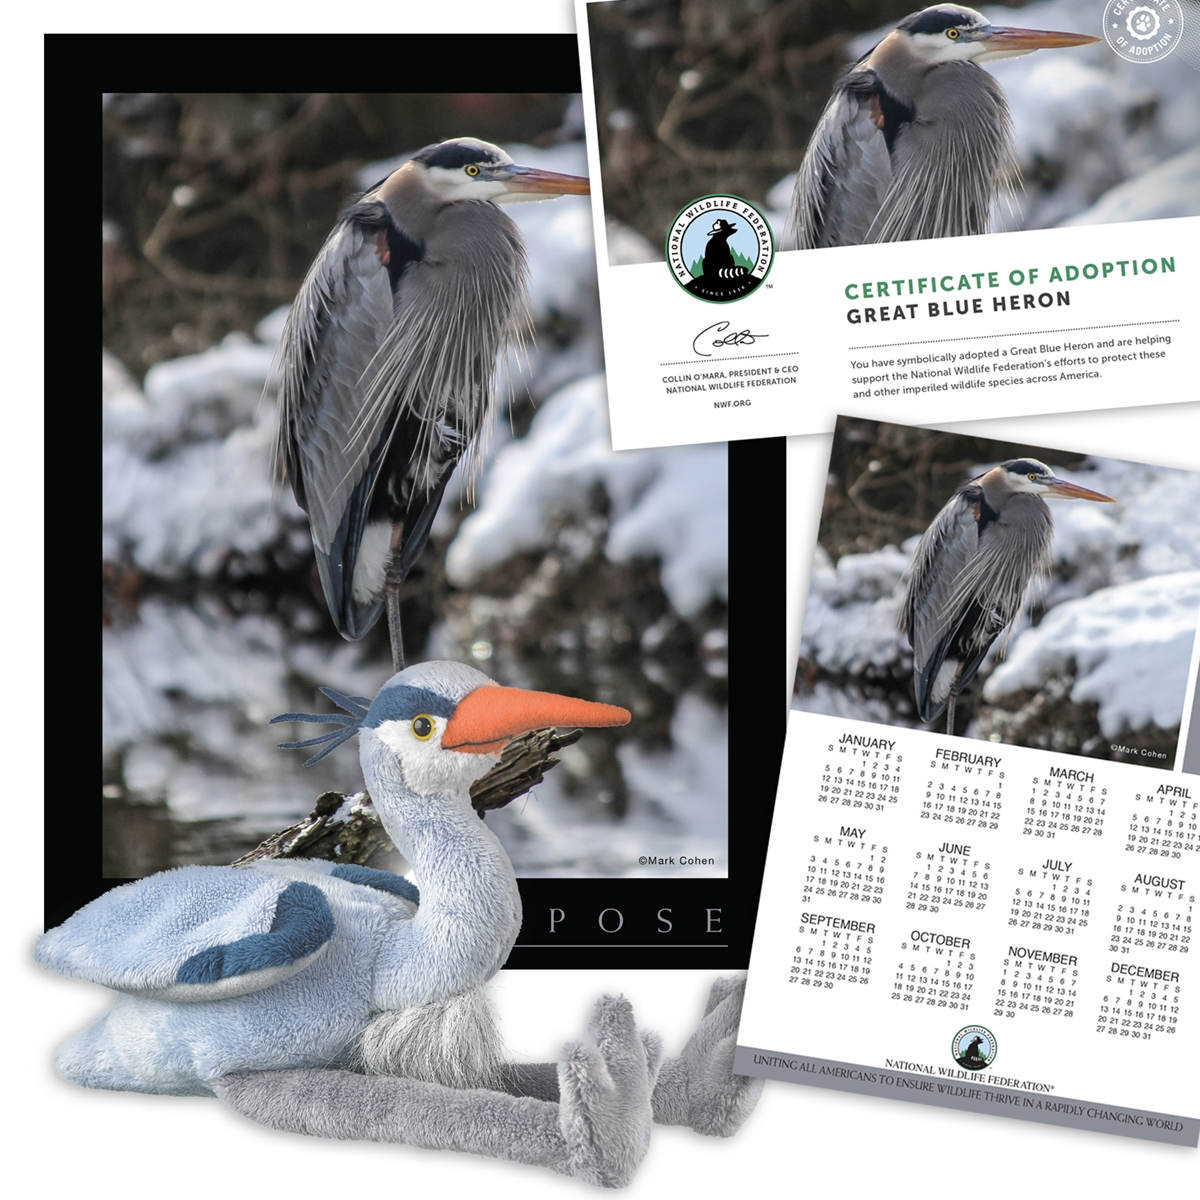 Adopt a Great Blue Heron